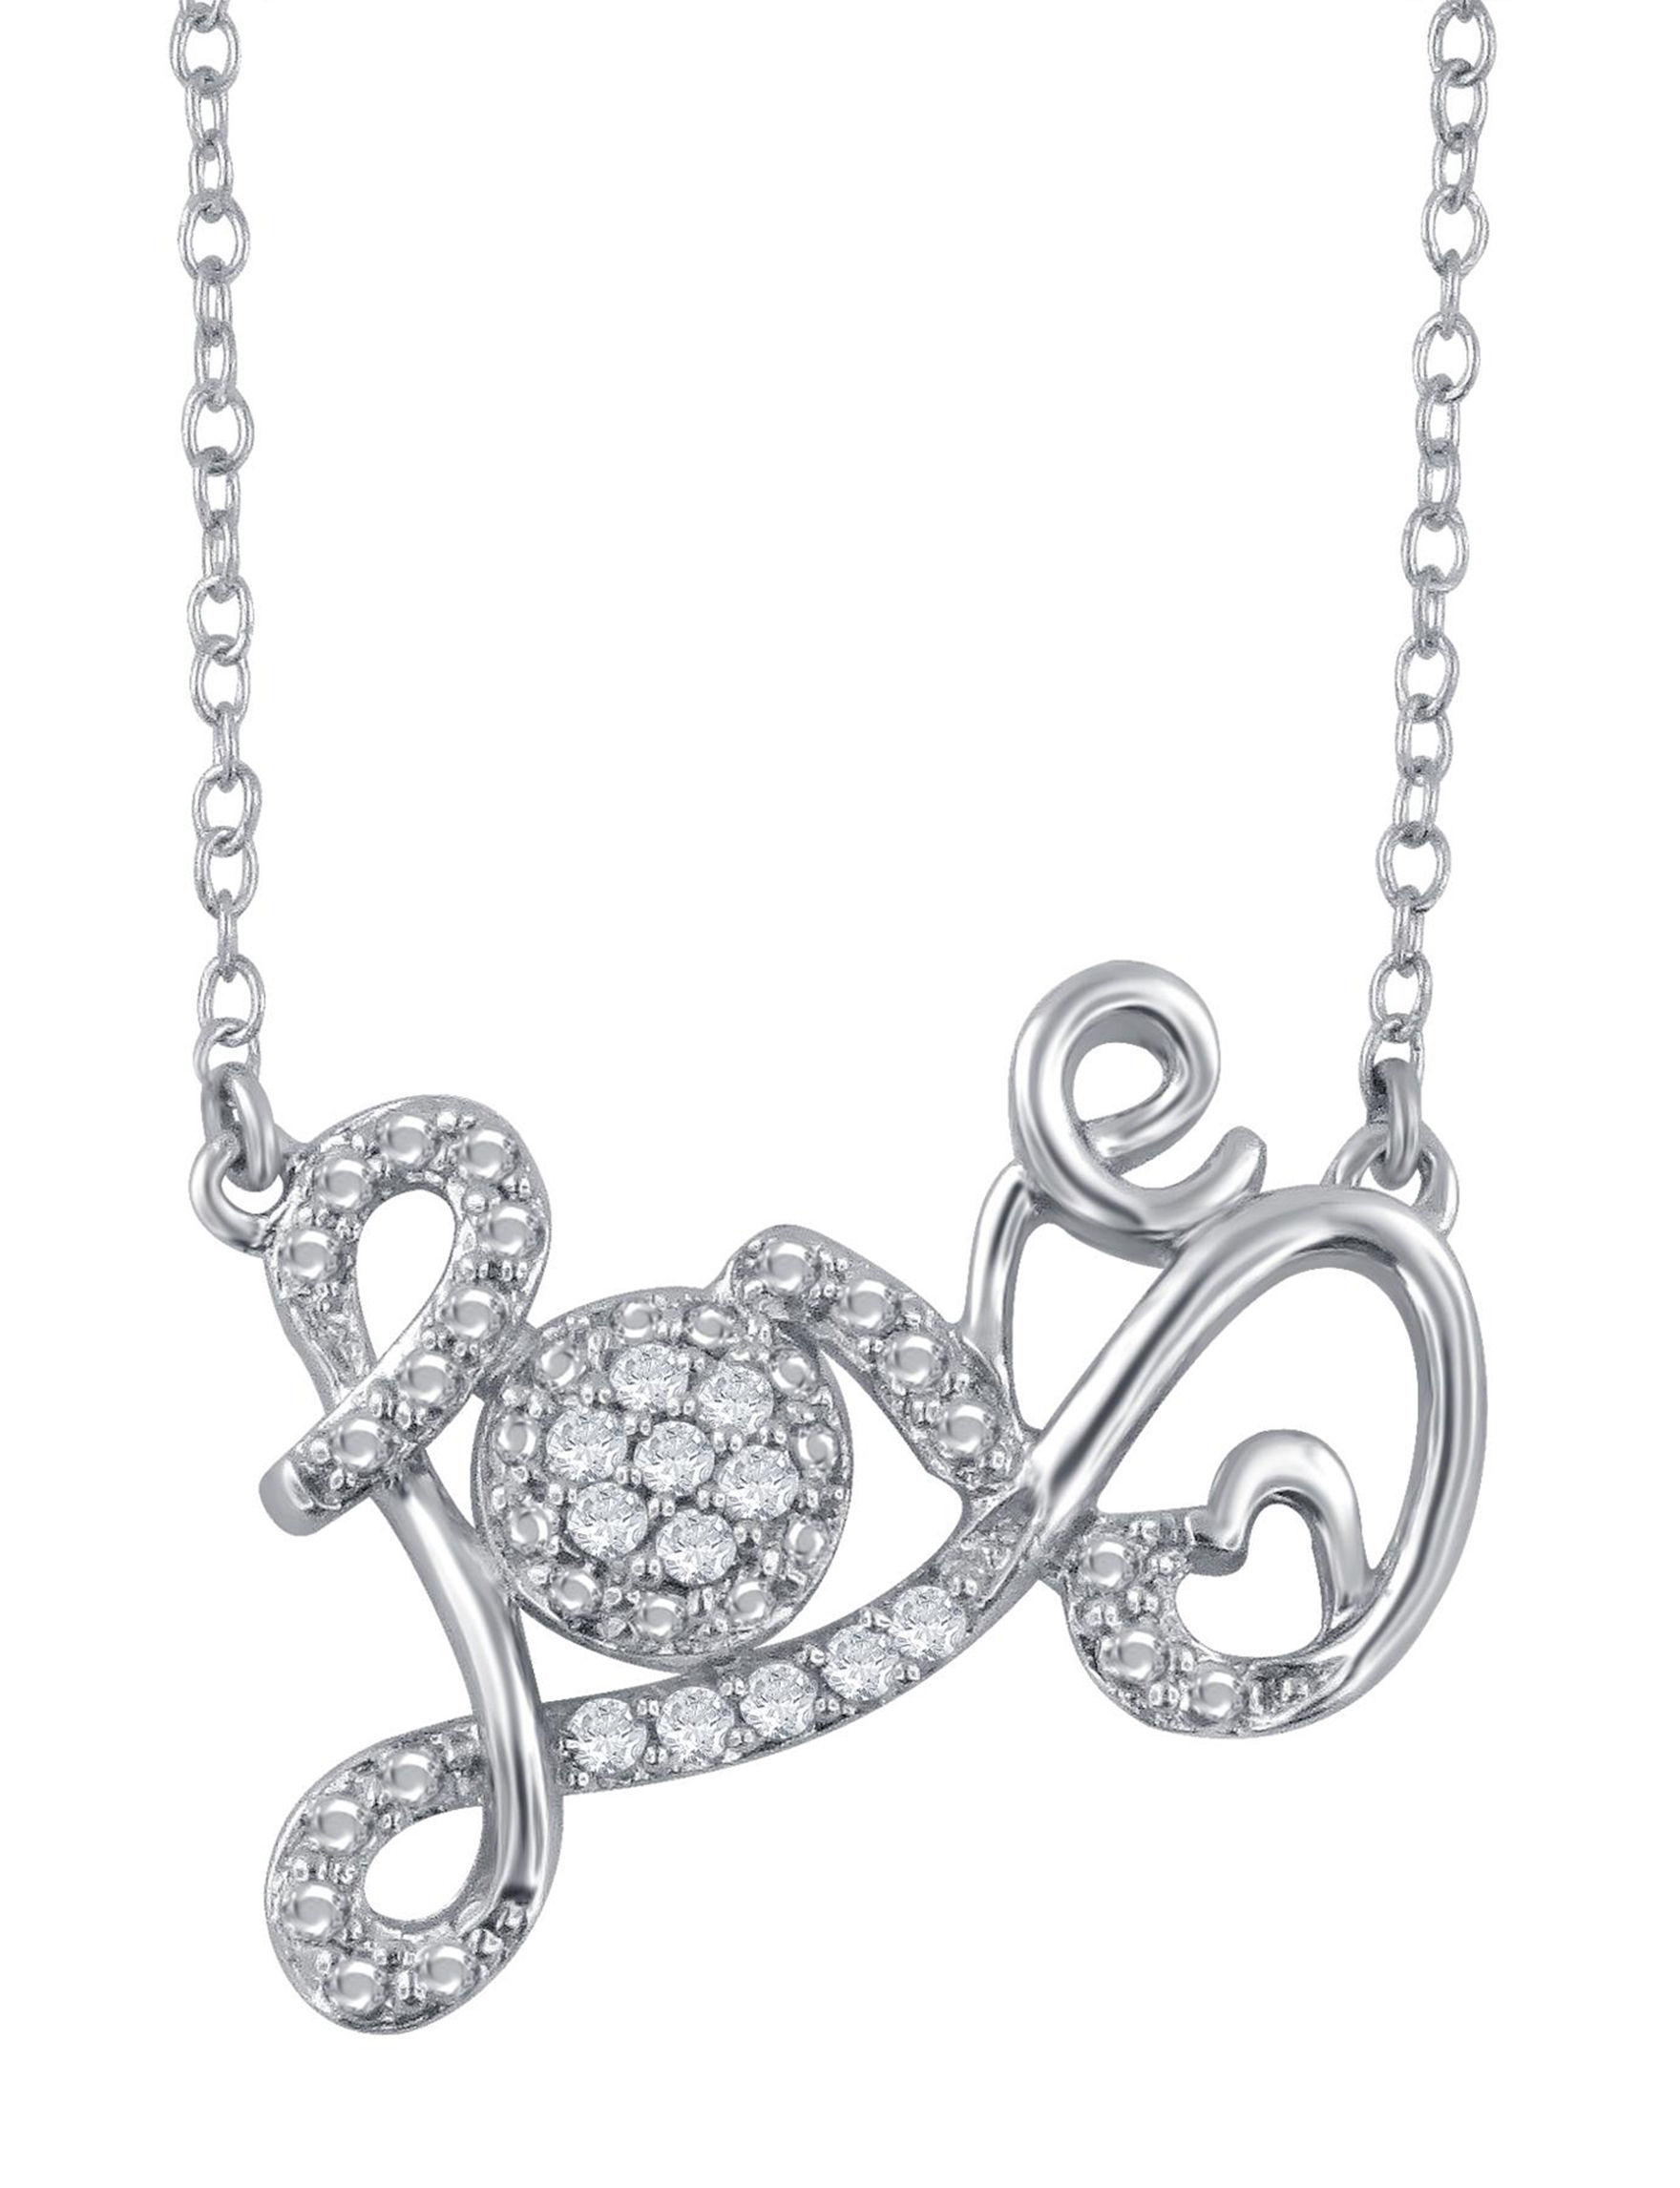 Kiran Silver Necklaces & Pendants Fine Jewelry